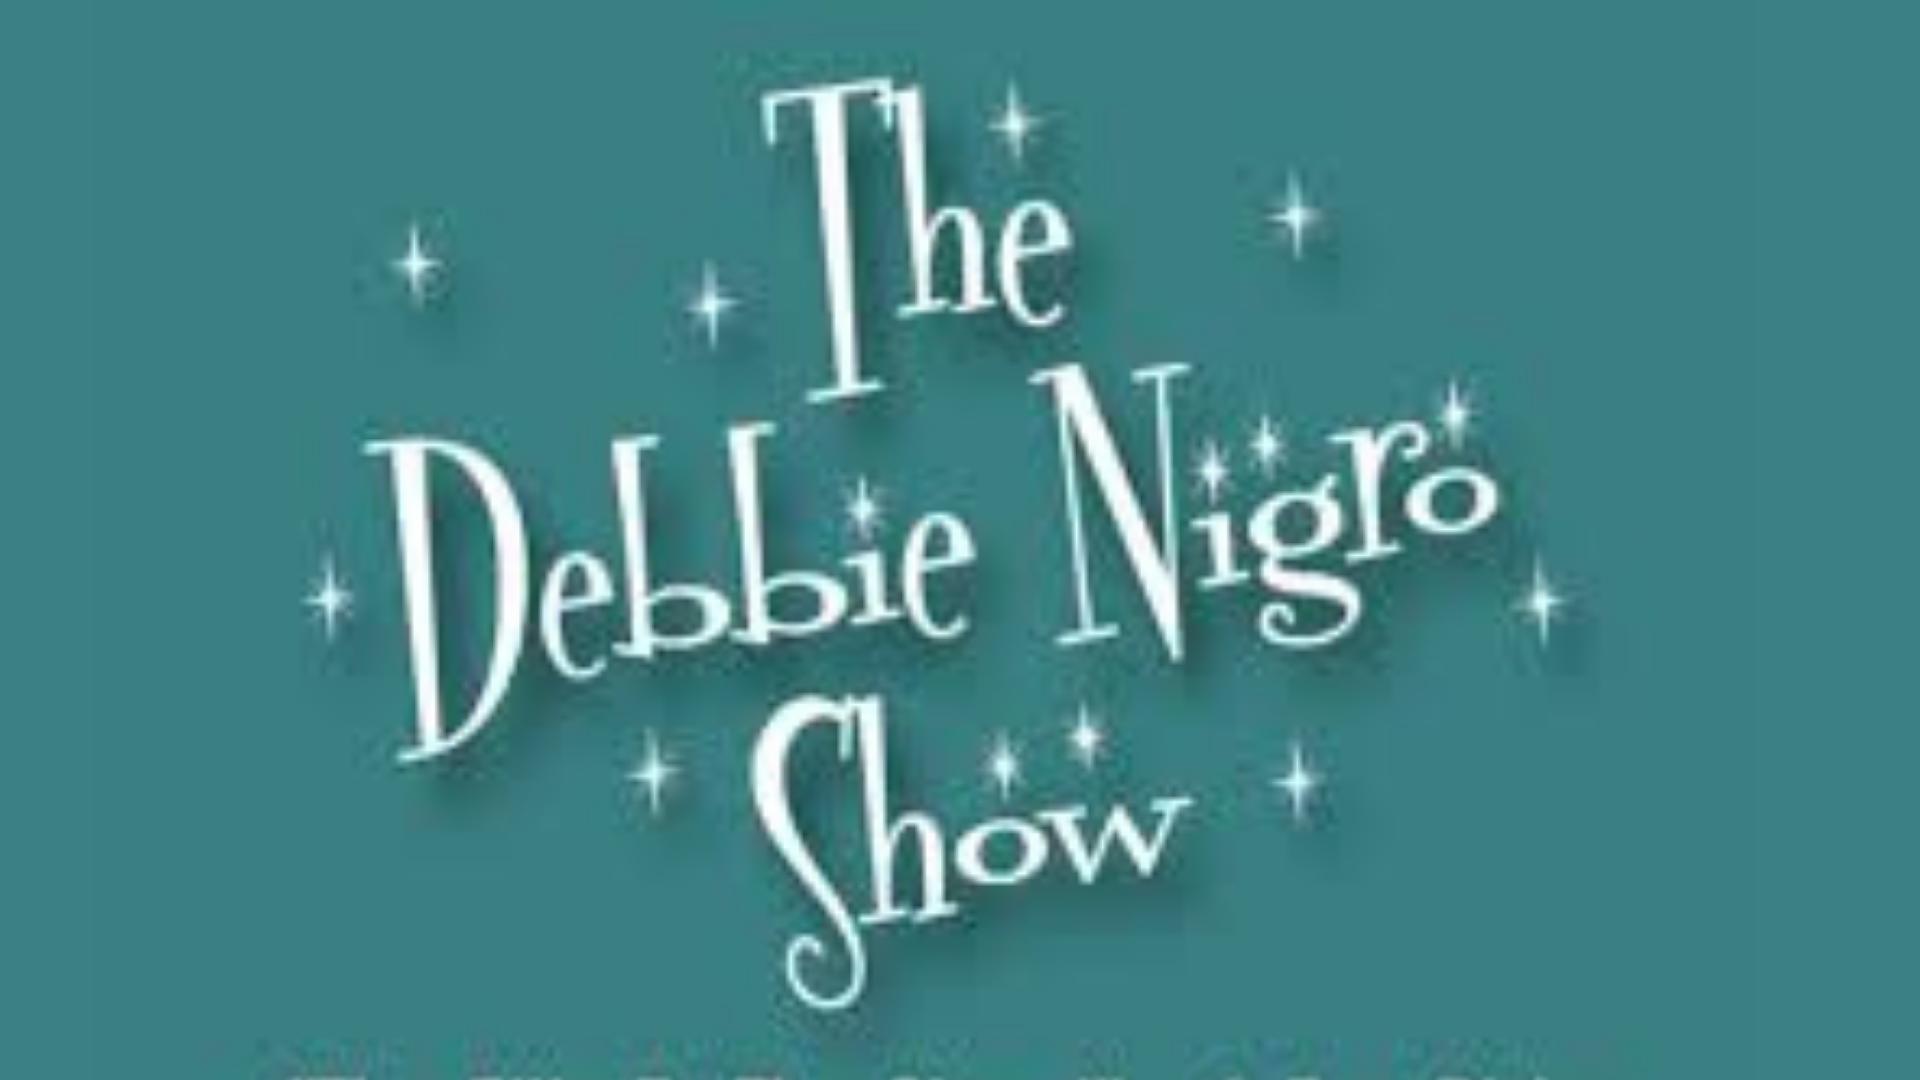 Debbie Nigro Show with Elizabeth DeRobertis